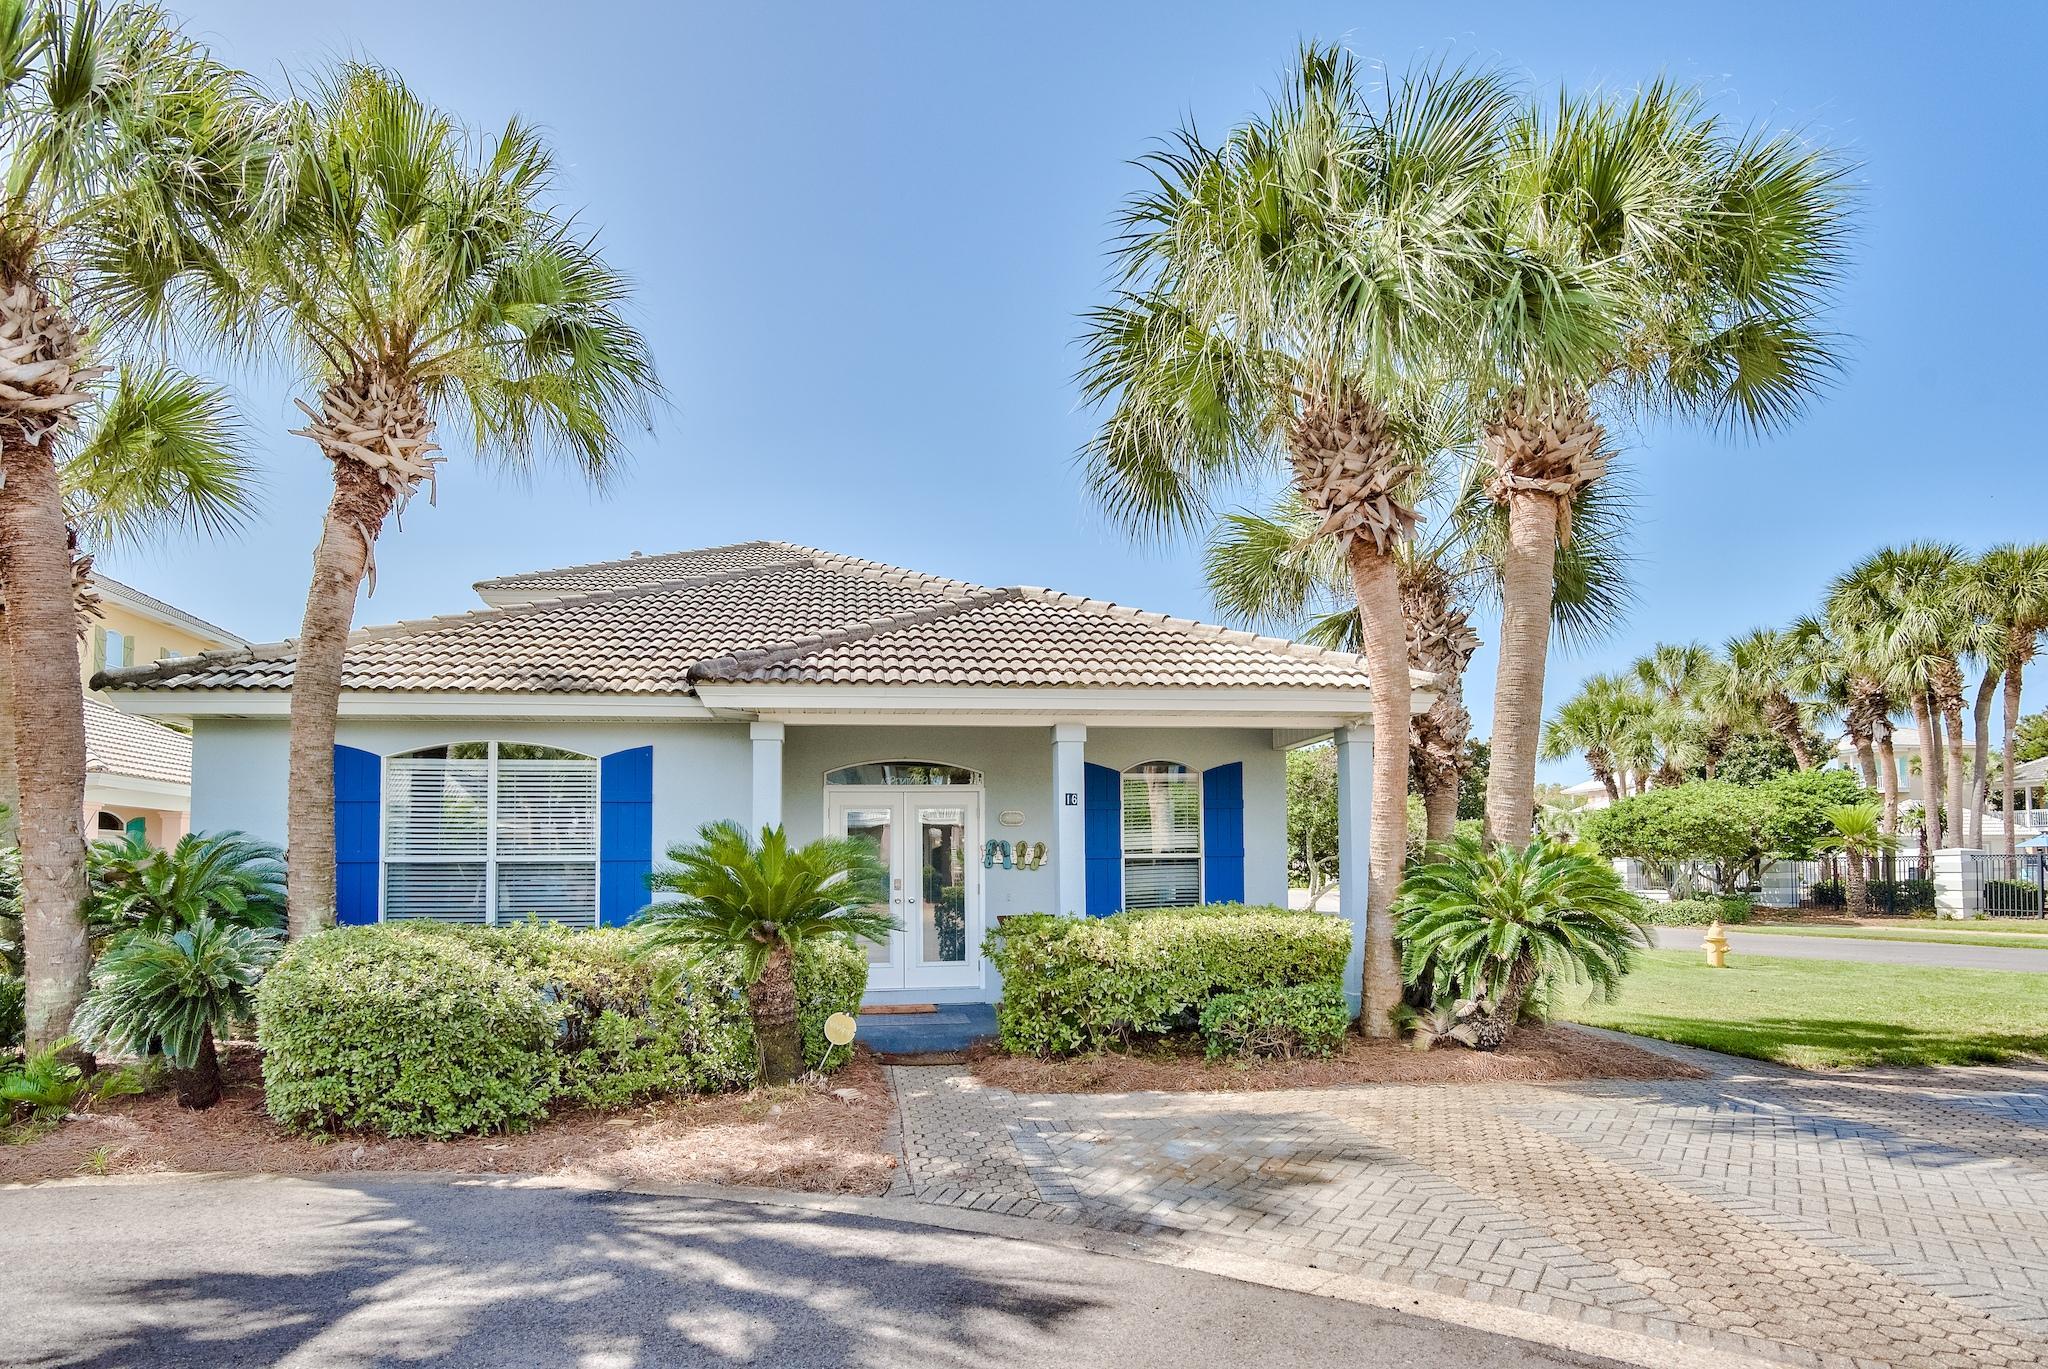 Photo of home for sale at 16 Ruby, Miramar Beach FL